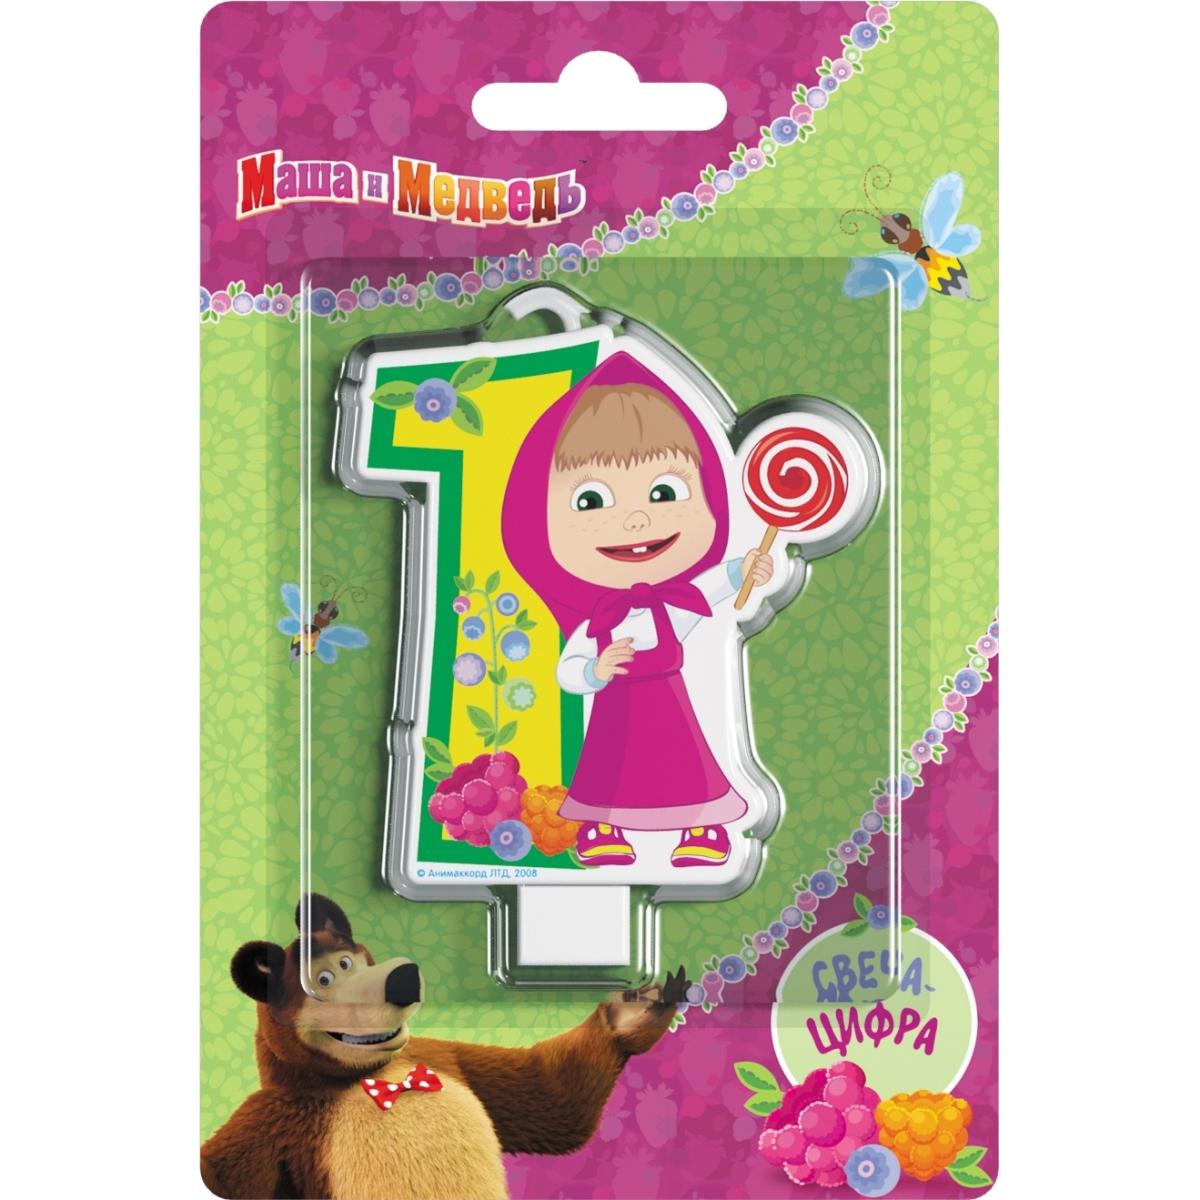 Декор Маша и Медведь Свеча Маша и Медведь «Цифра 1» кукла маша в красном сарафане маша и медведь